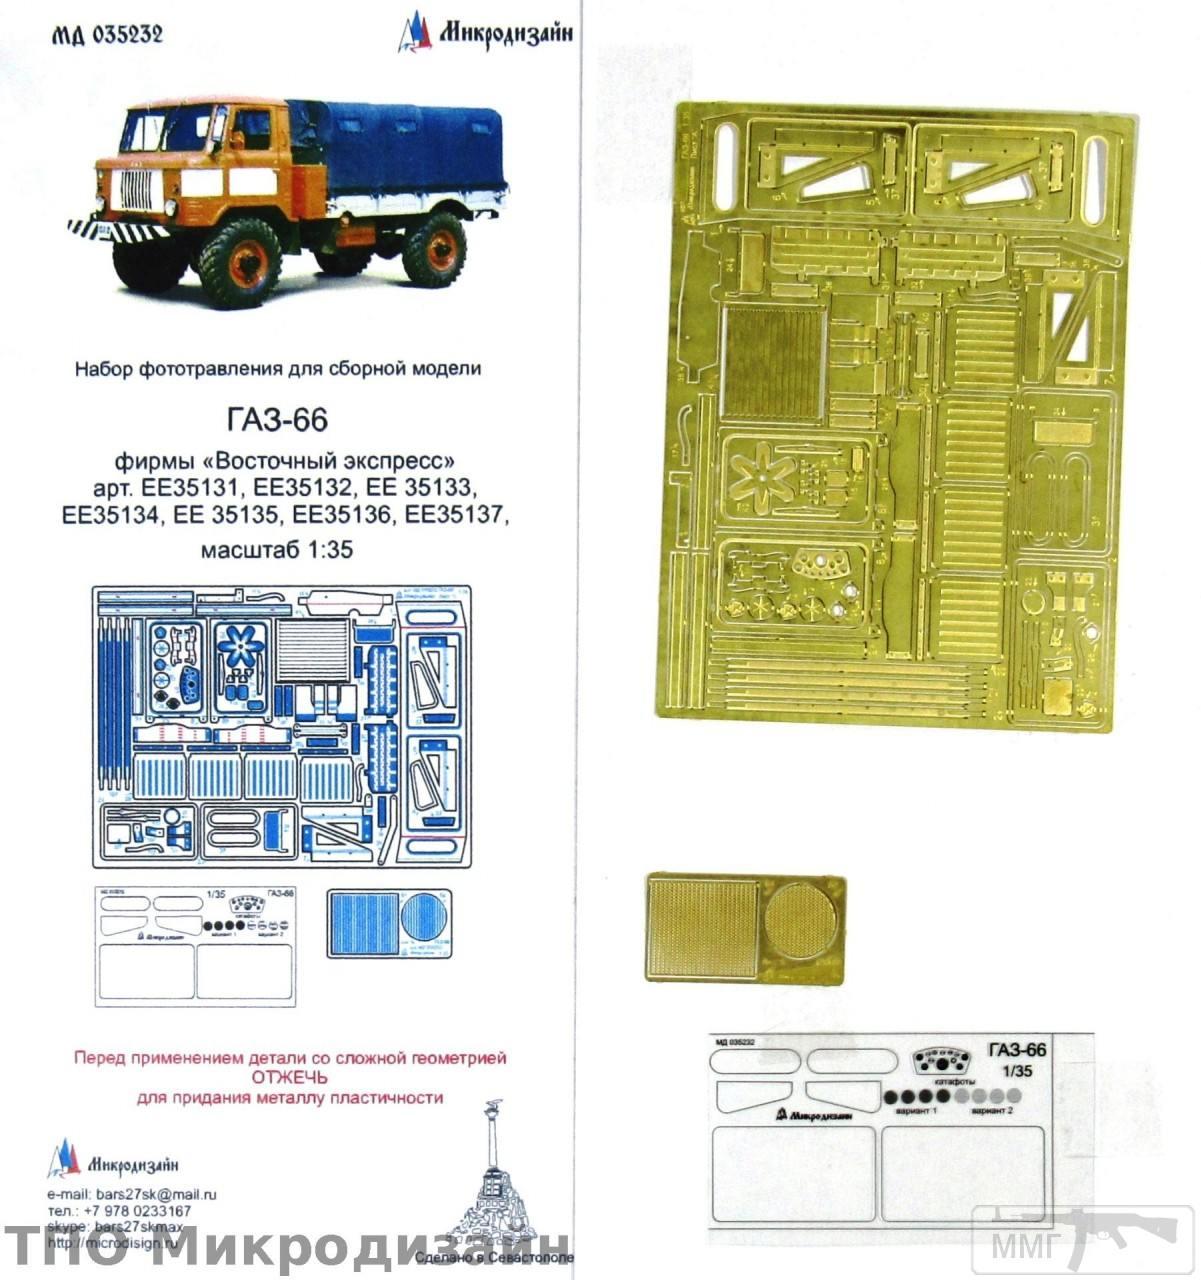 54566 - Обзор моделей и афтемаркета.